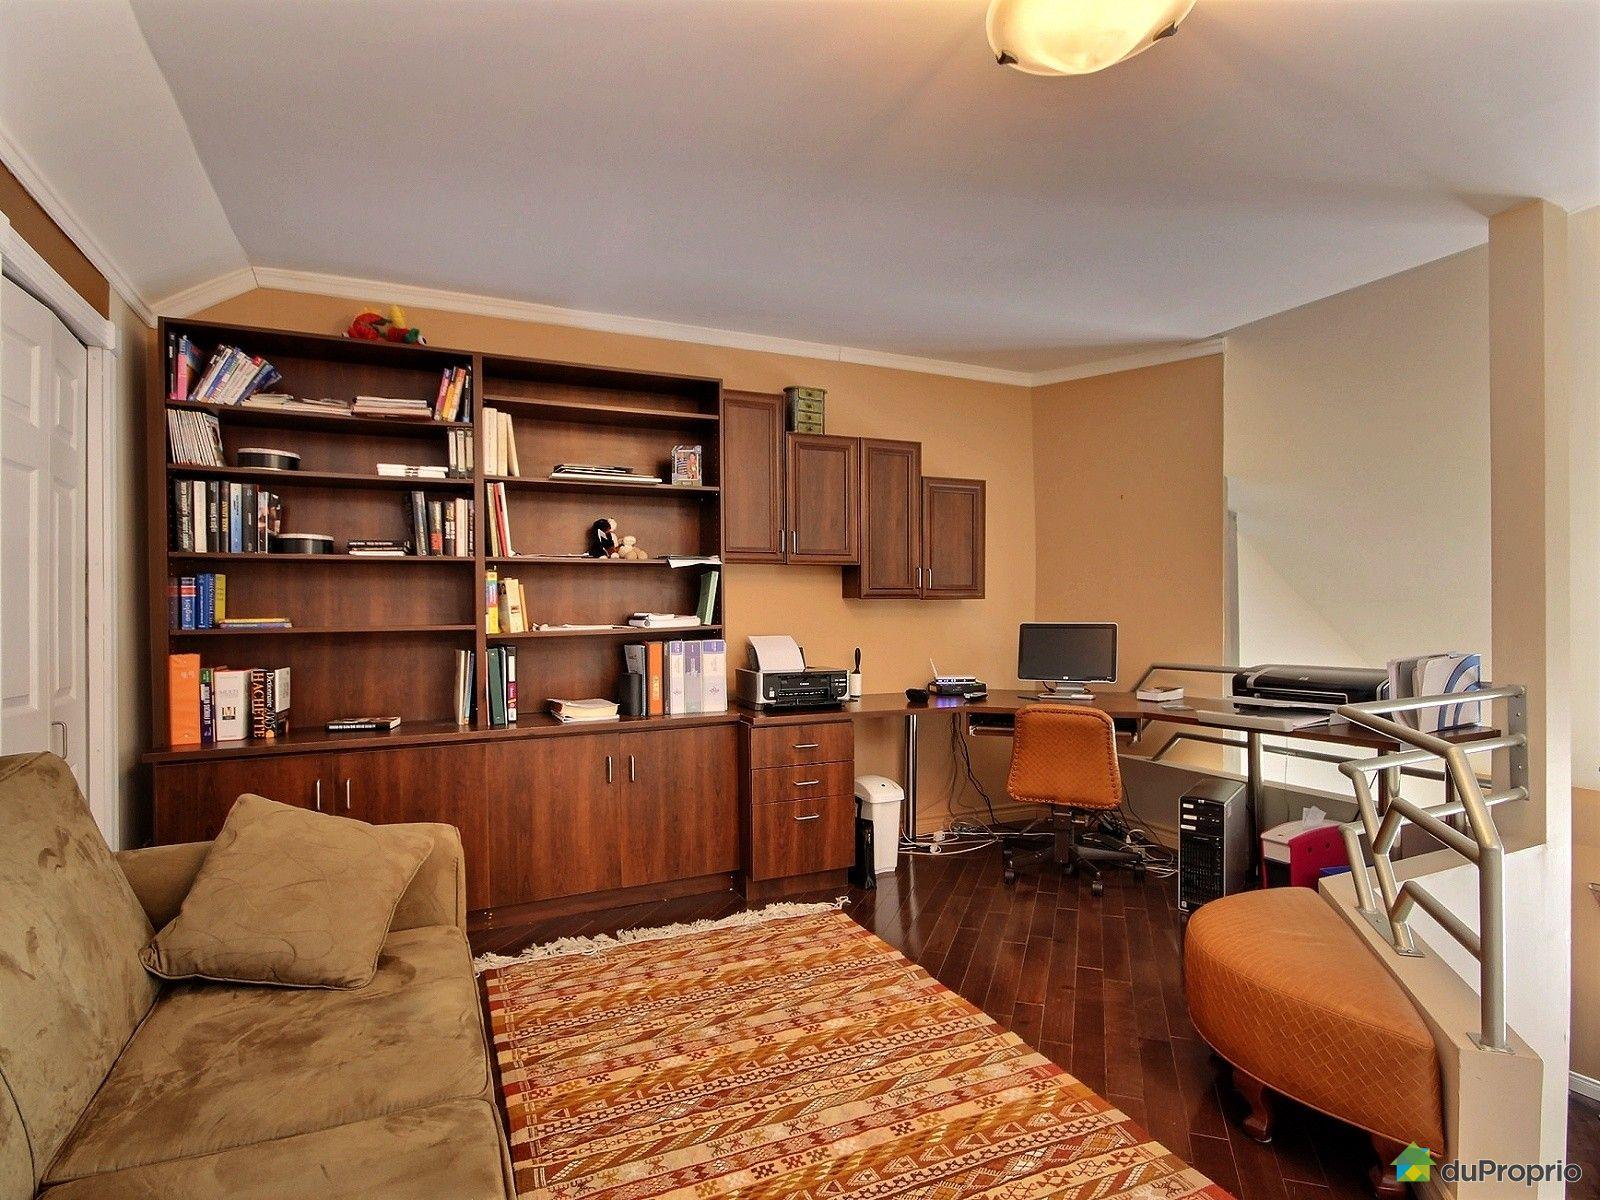 condo vendu jonqui re immobilier qu bec duproprio 577272. Black Bedroom Furniture Sets. Home Design Ideas